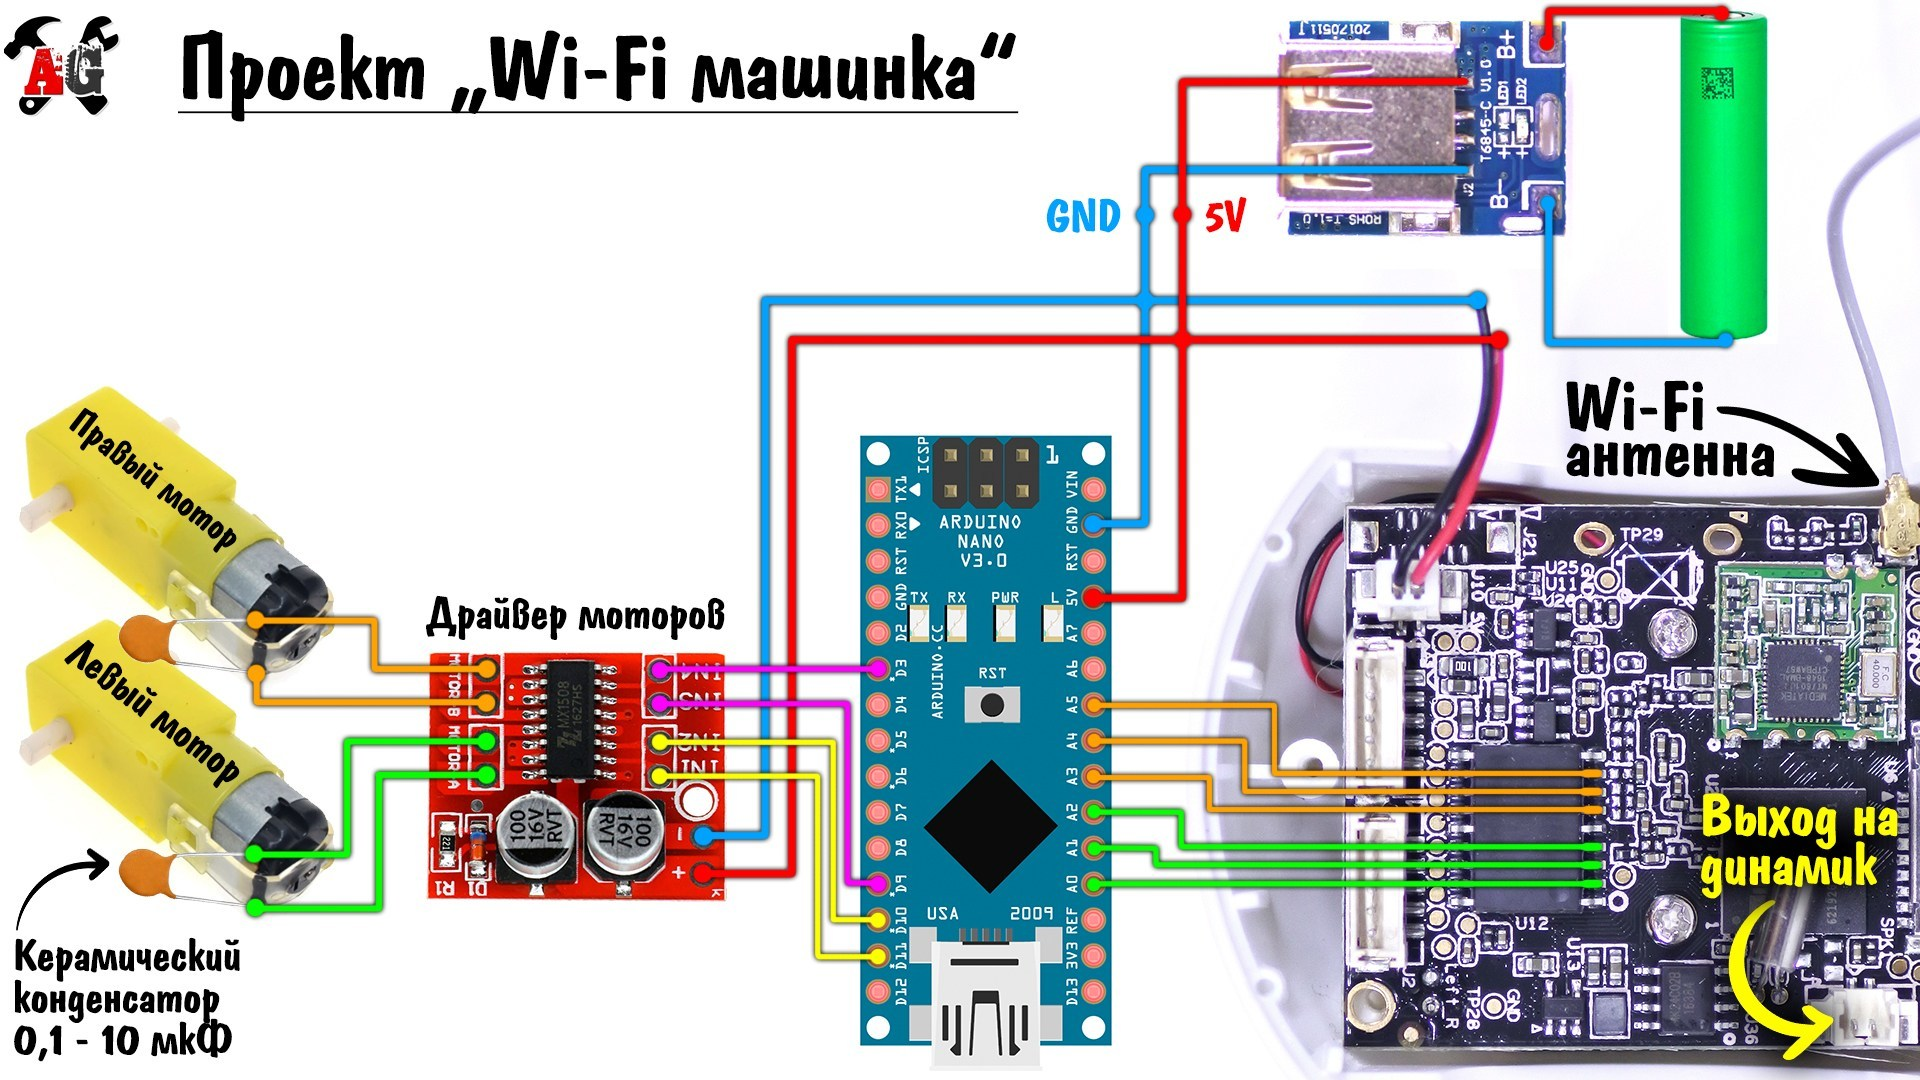 stärka wifi signal